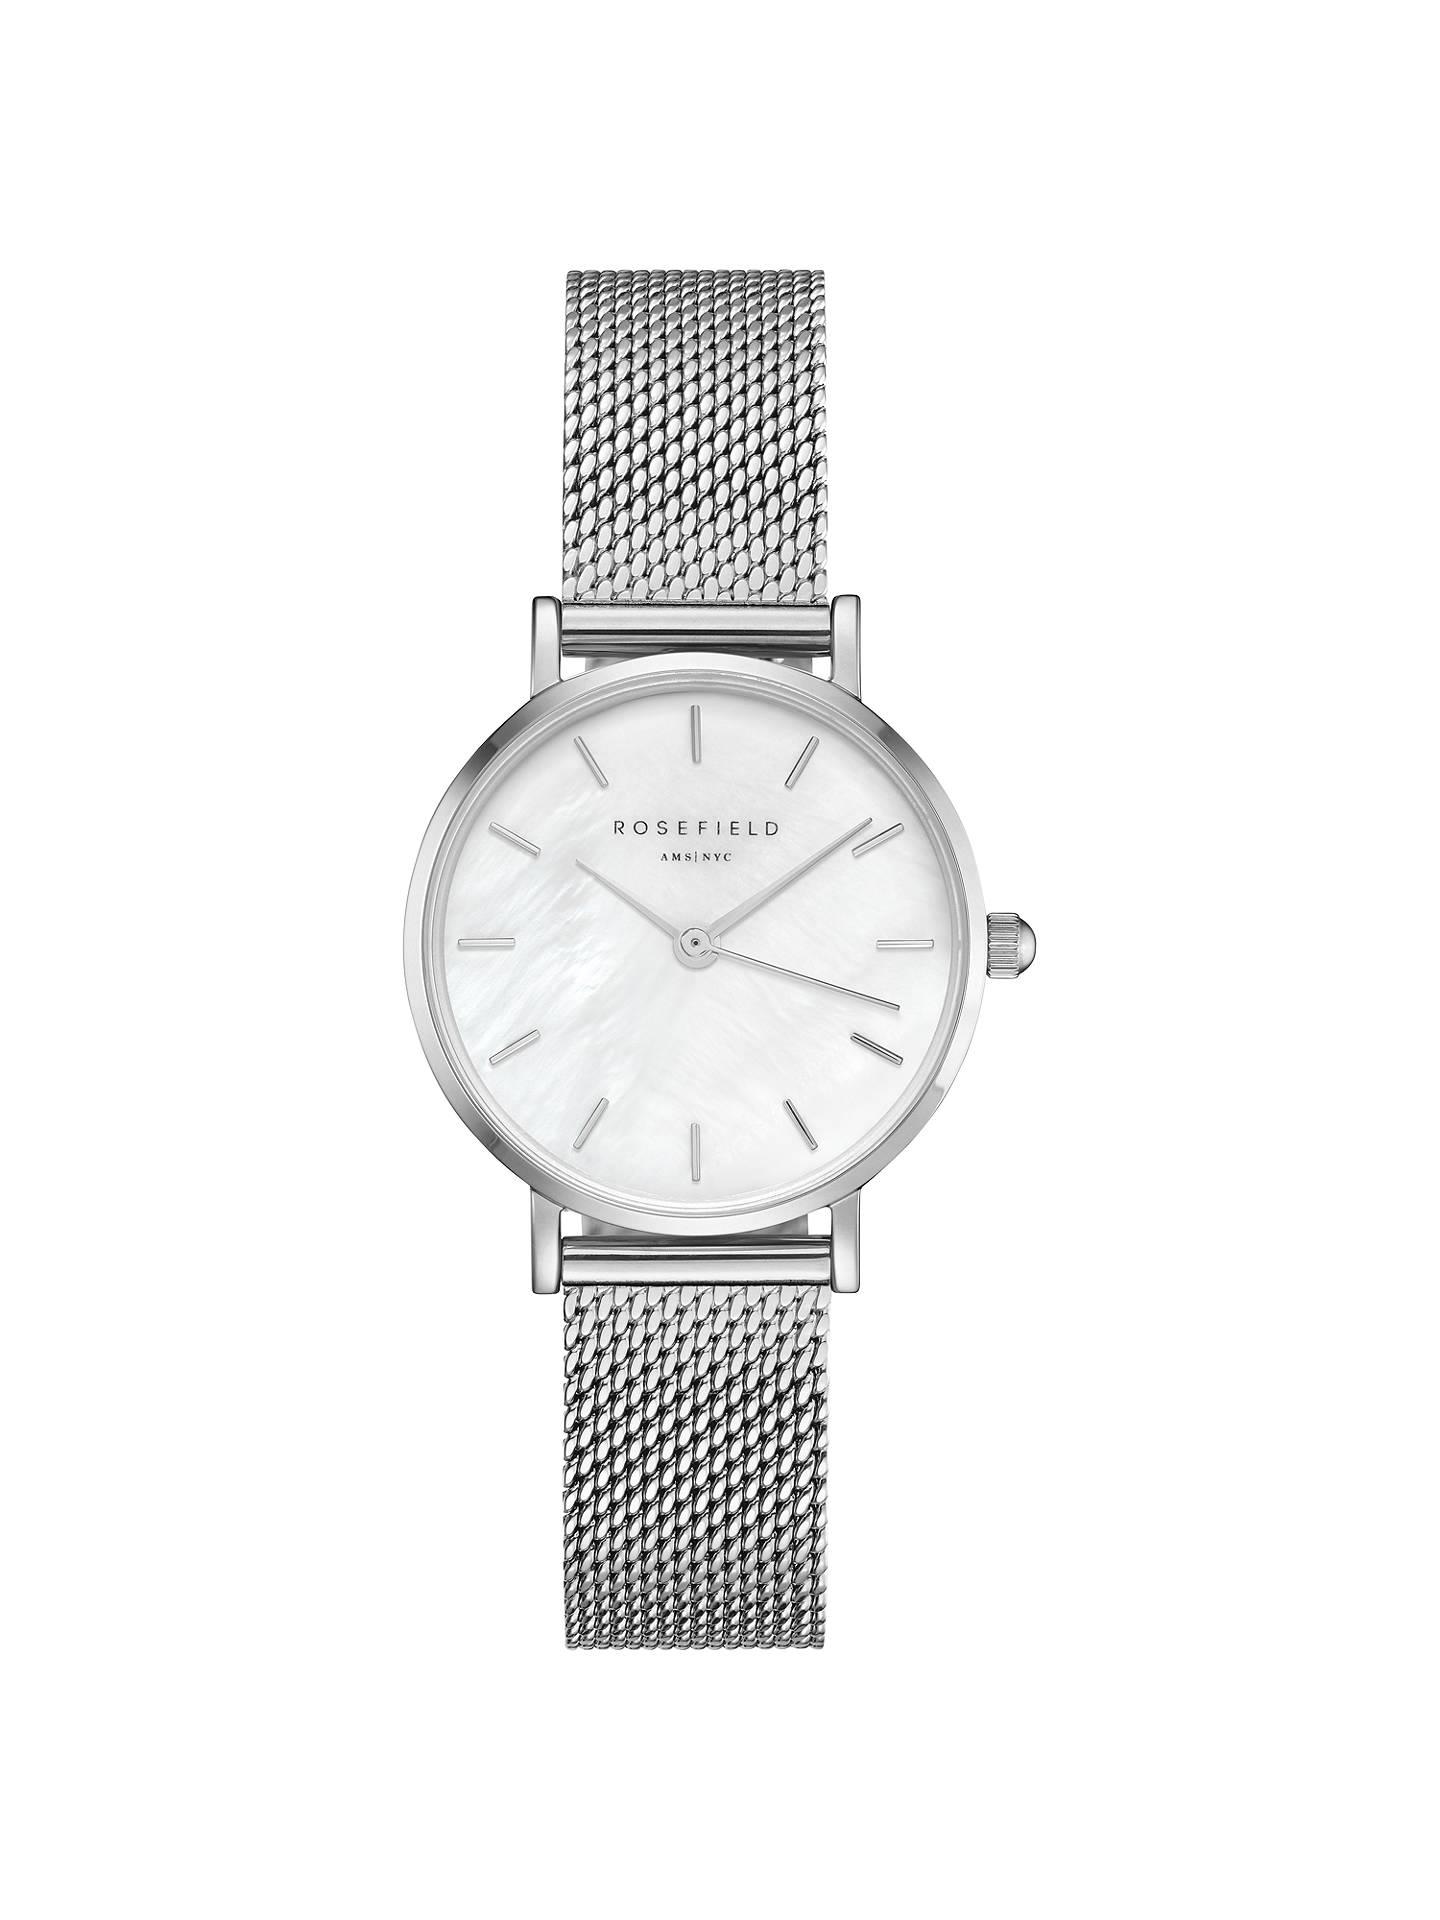 ROSEFIELD Women s The Small Edit Mesh Bracelet Strap Watch at John ... 6a77fa392ee9